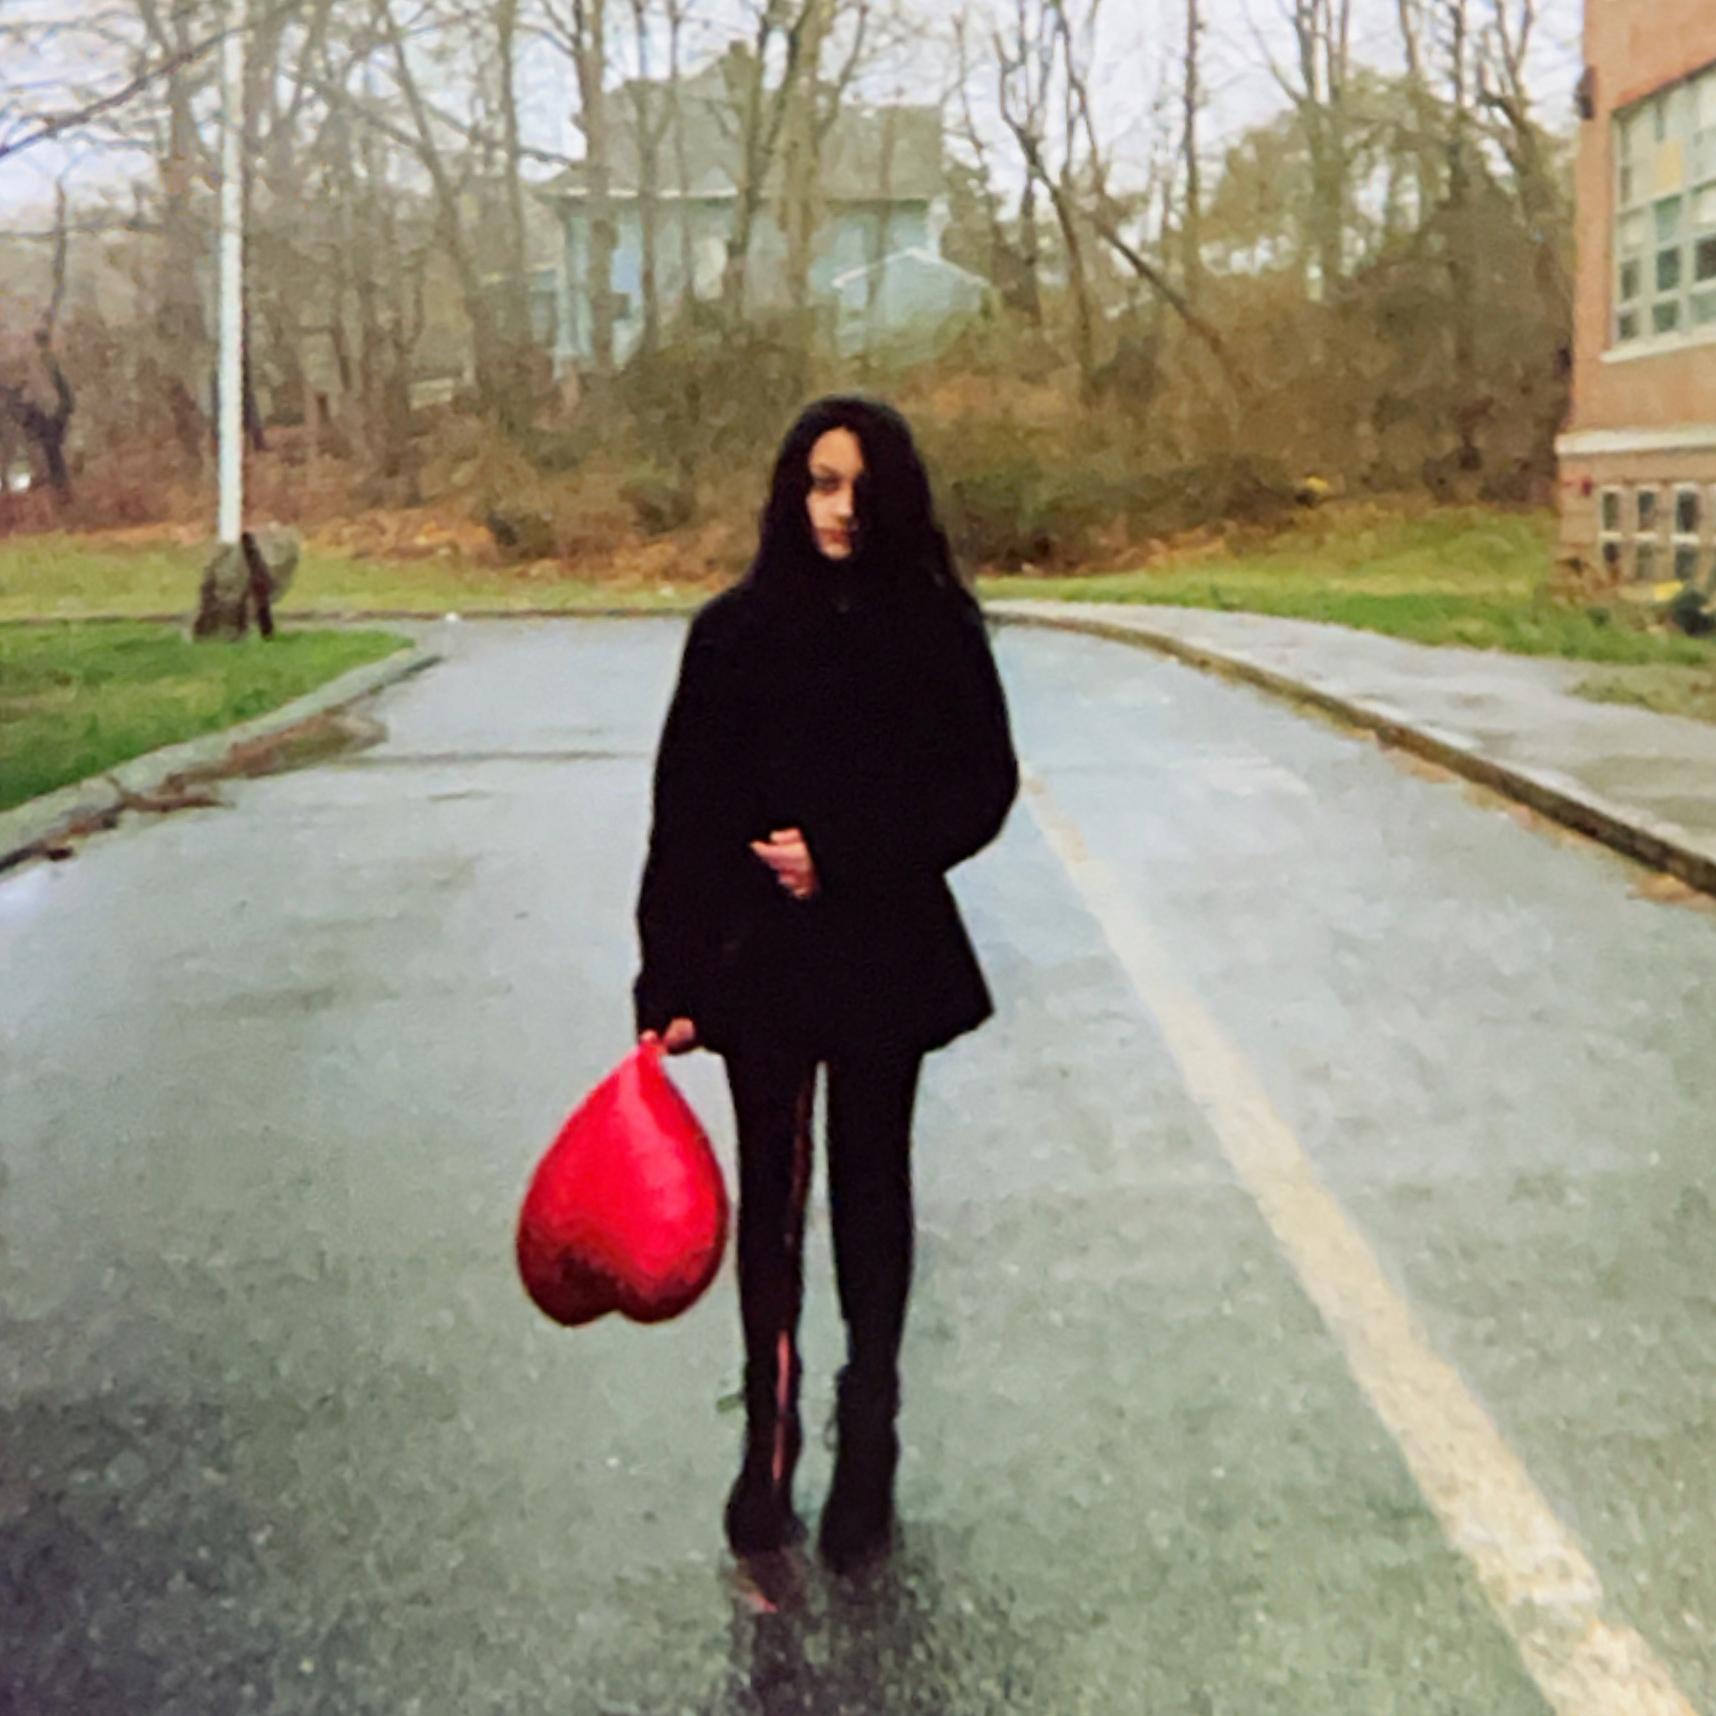 Emily Pruitt, Anti-Romantic, 2021